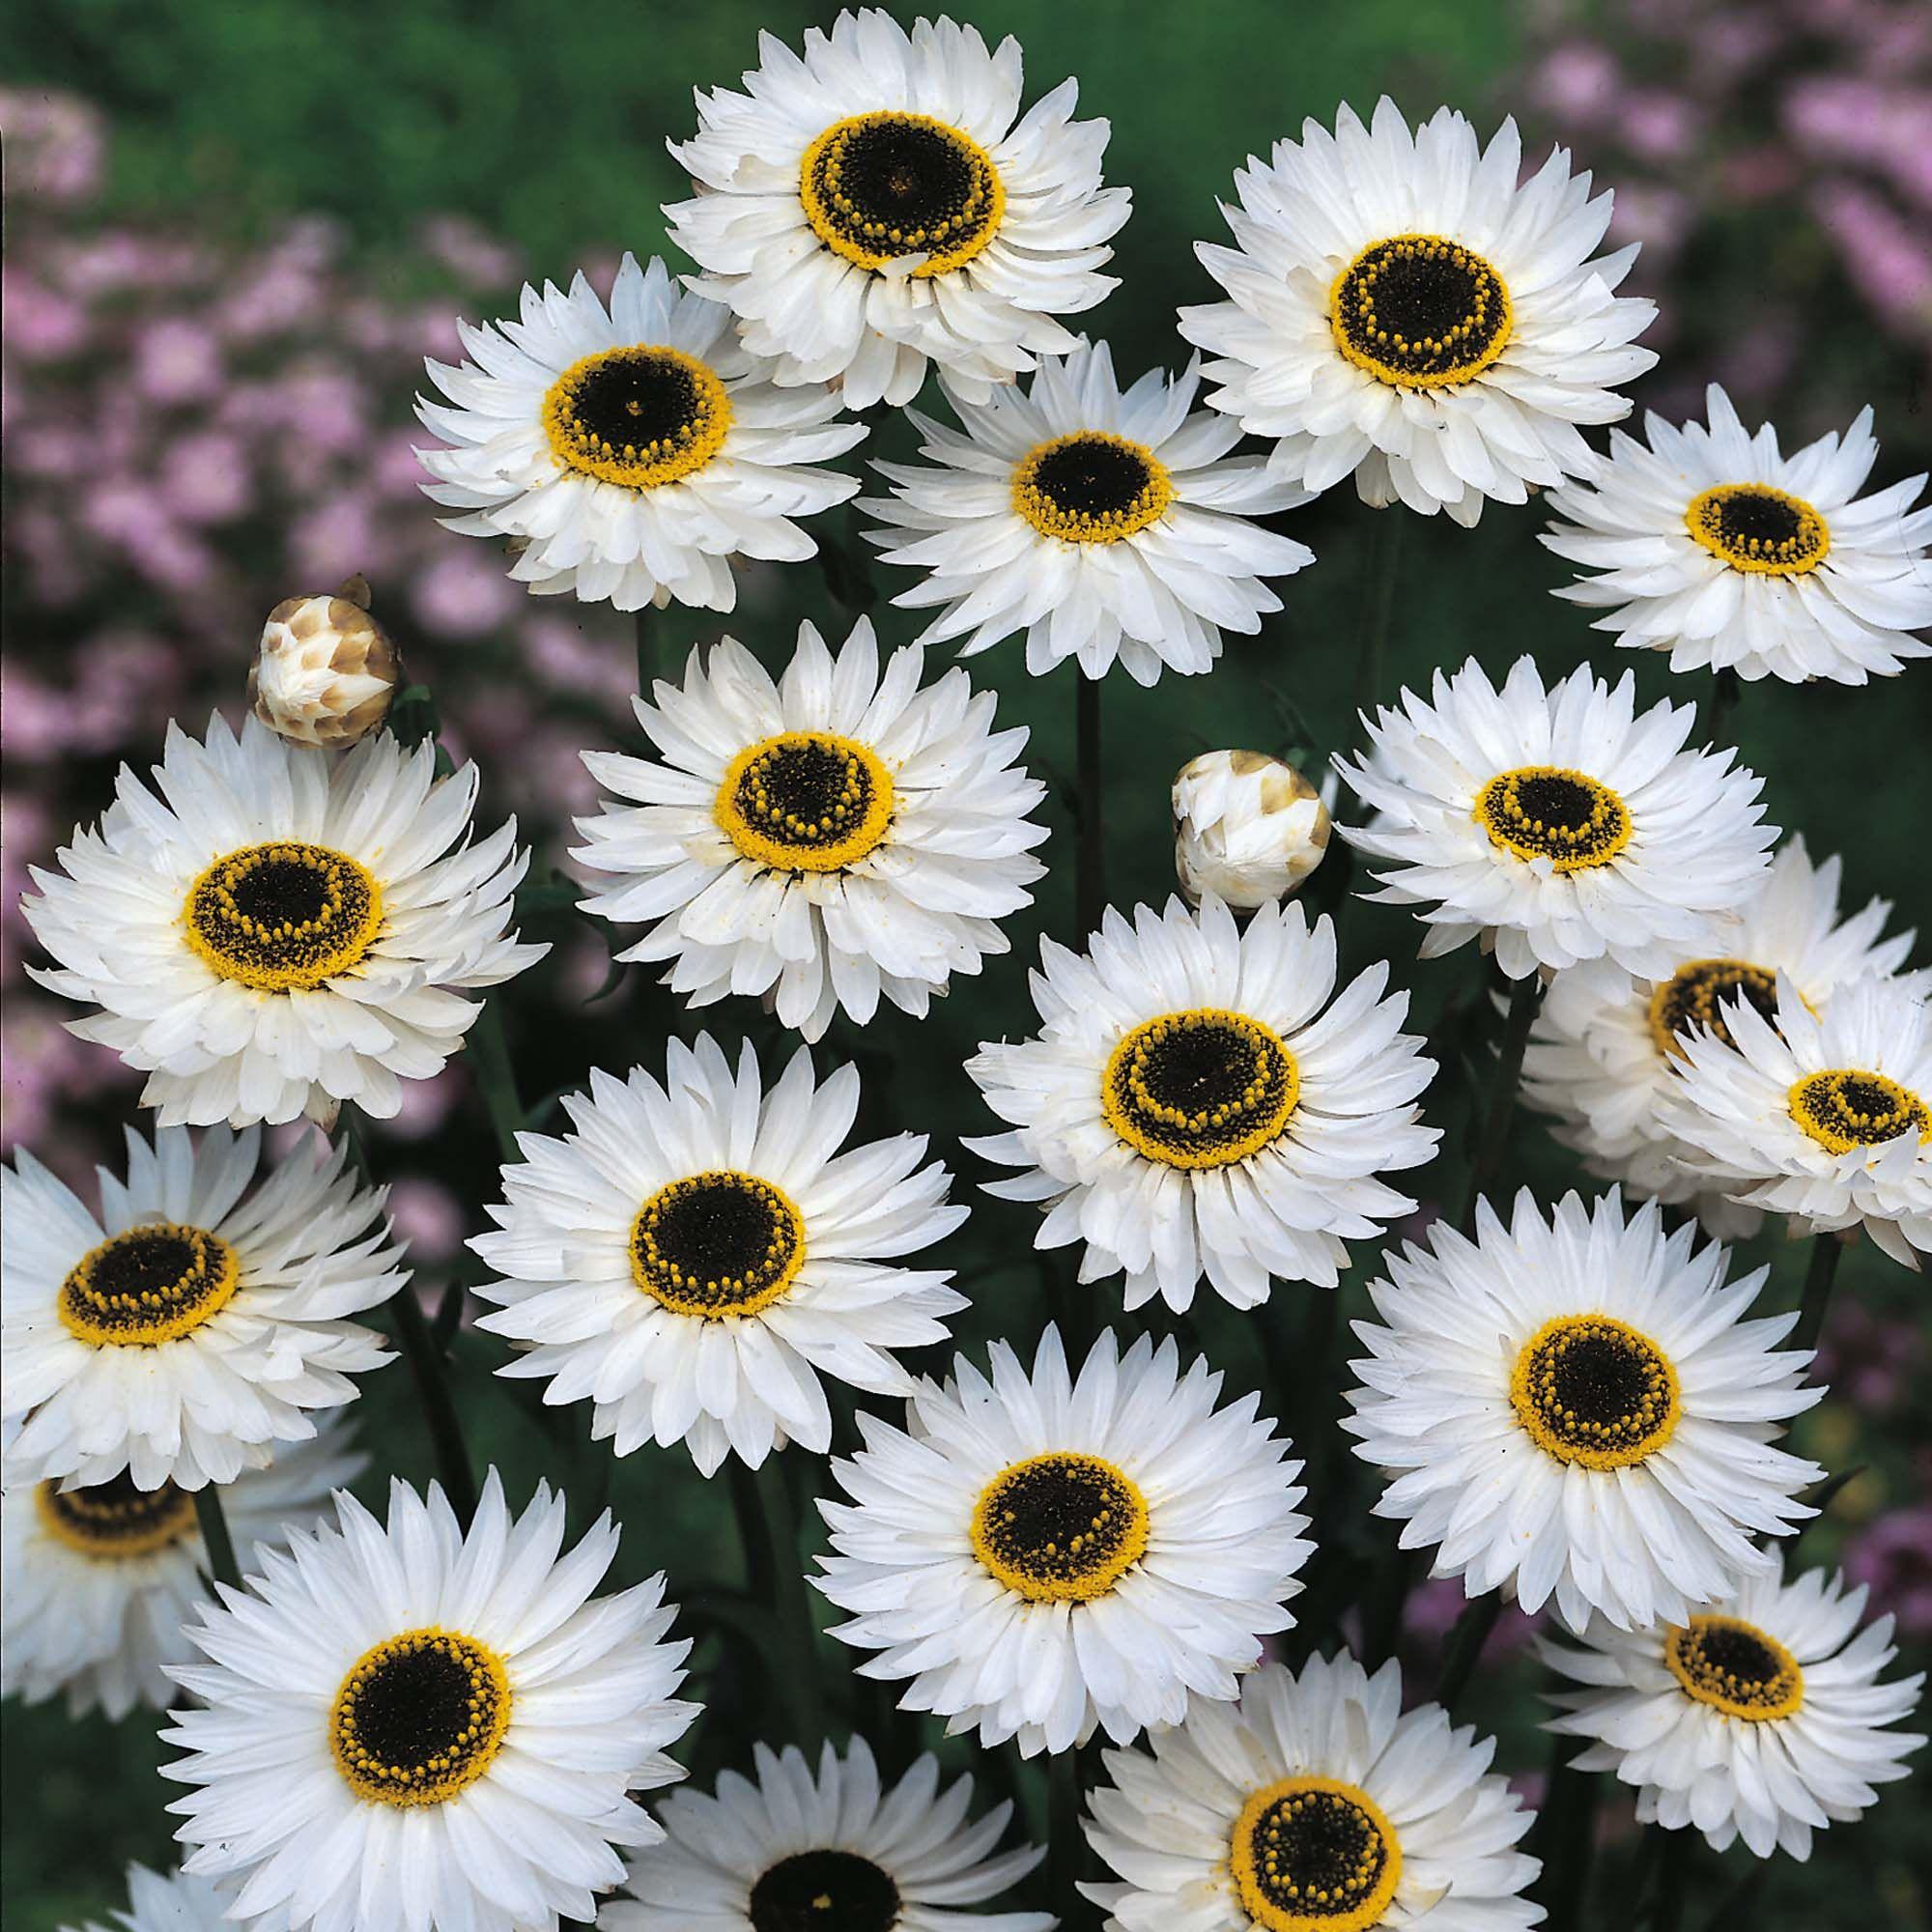 Helipterum Pierrotstrawflower Daisies Asters Sunflowers